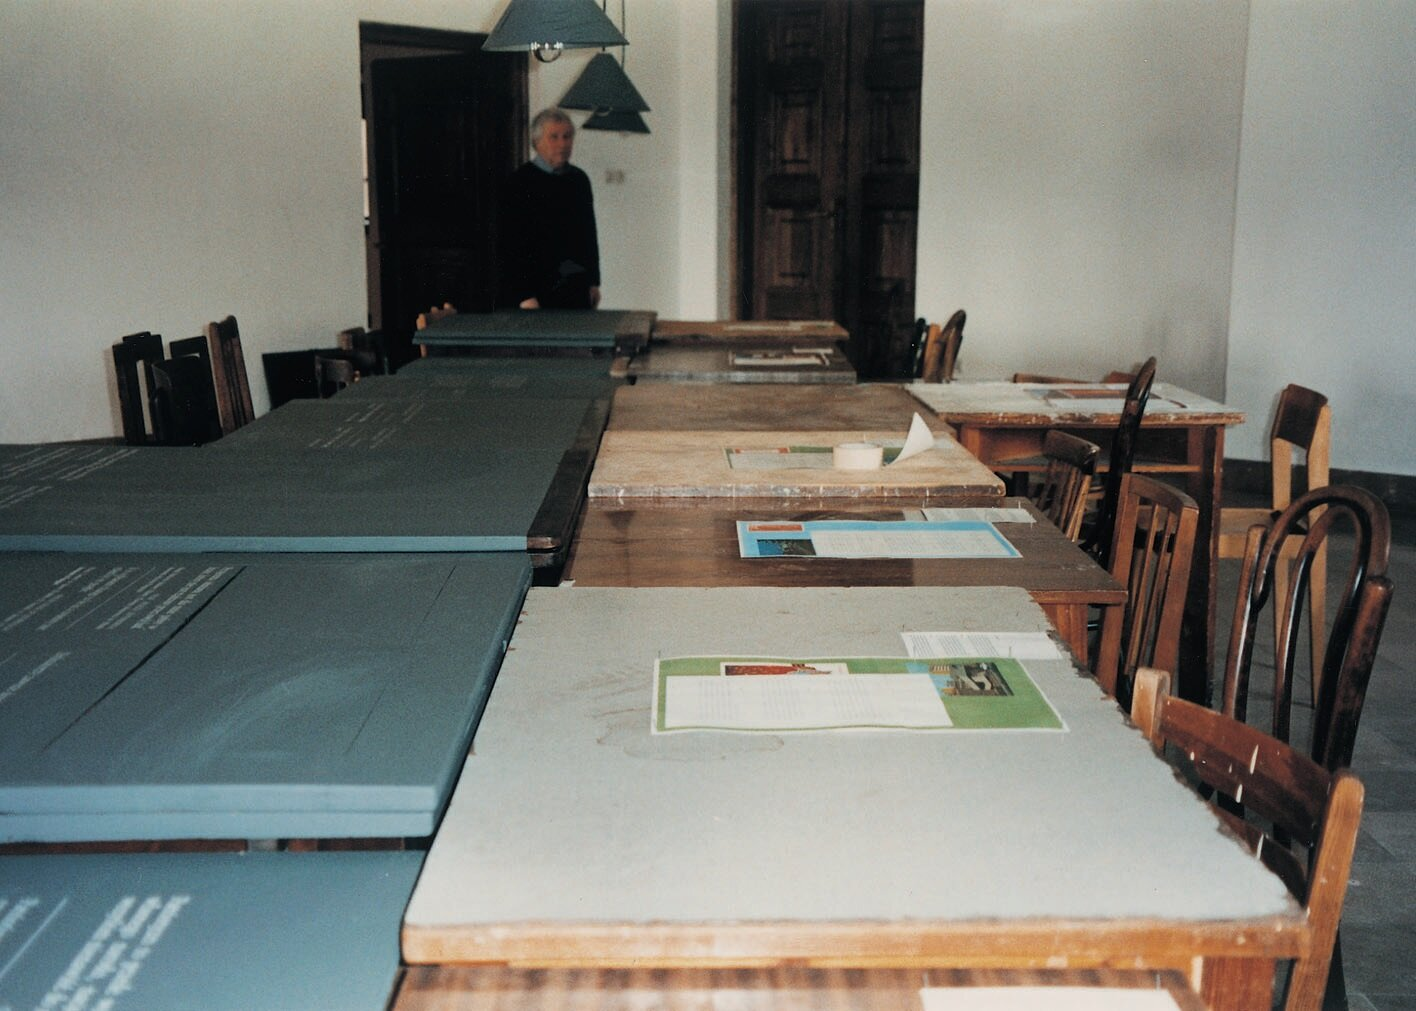 Ilya-Kabakov-in-the-installation-of-the-Centrum-Sztuki-Wspó≥czesnej-Zamek-Ujaz.jpg